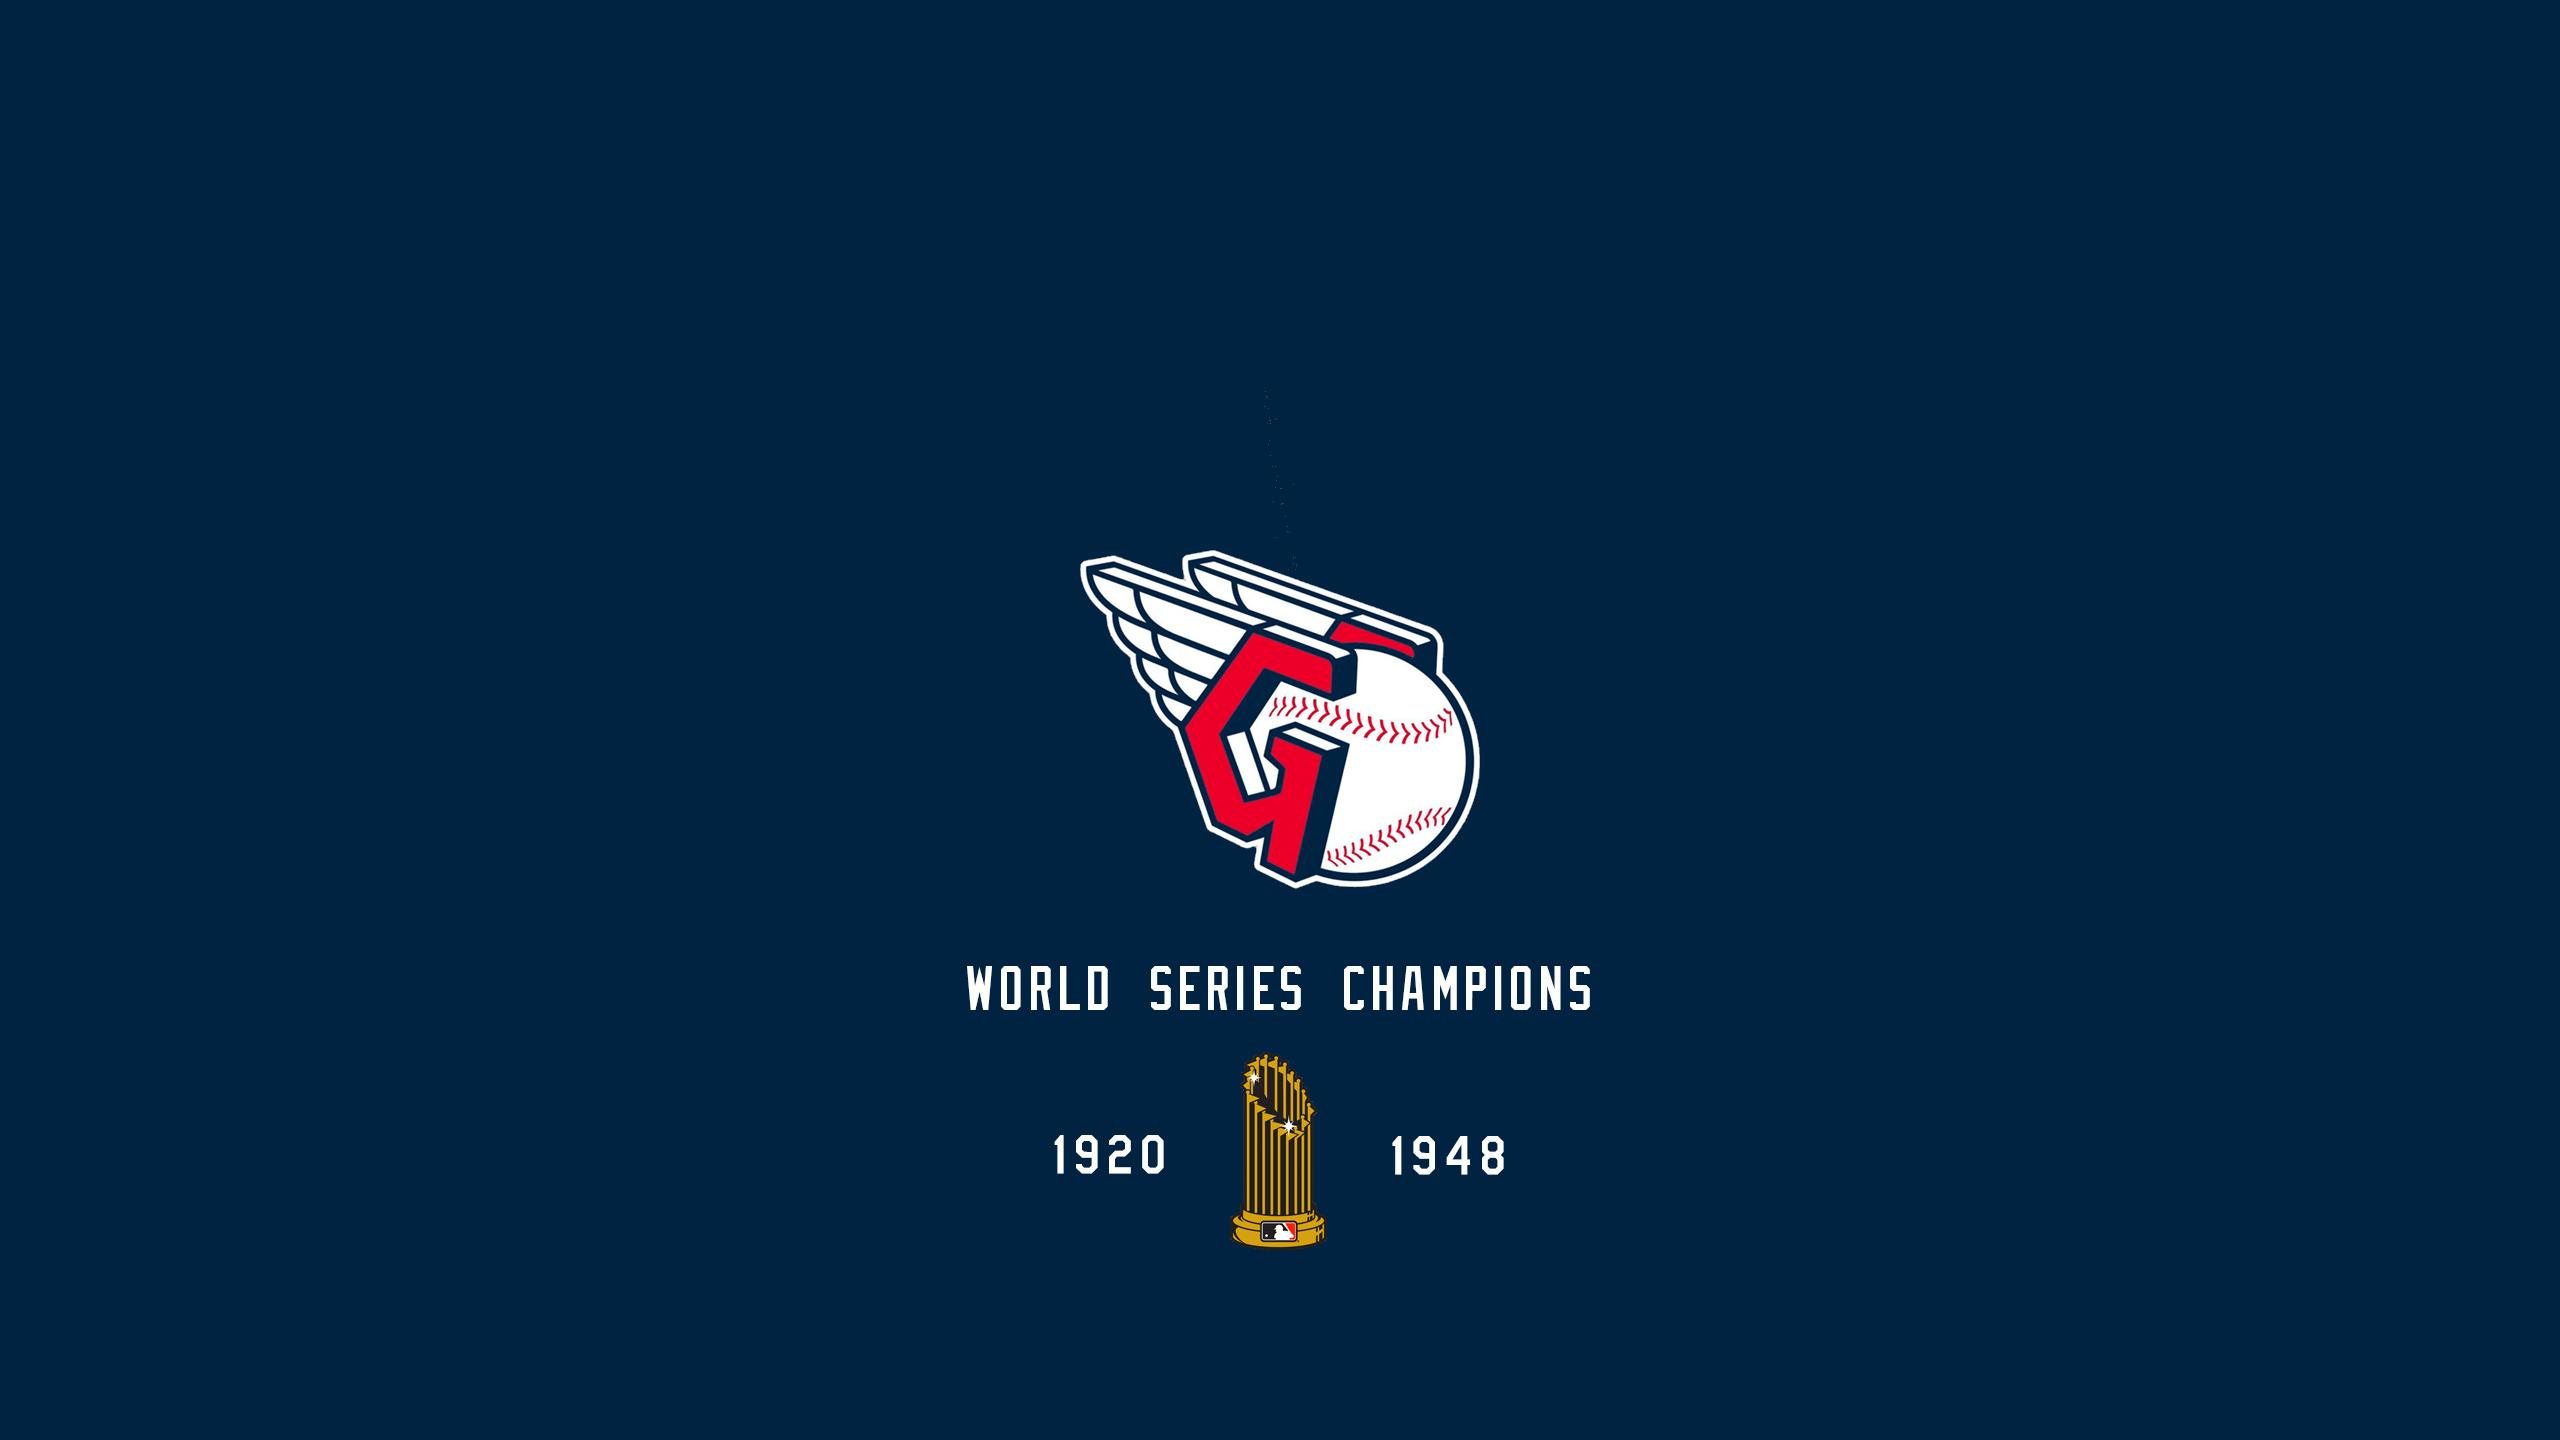 Cleveland Guardians - World Series Champs